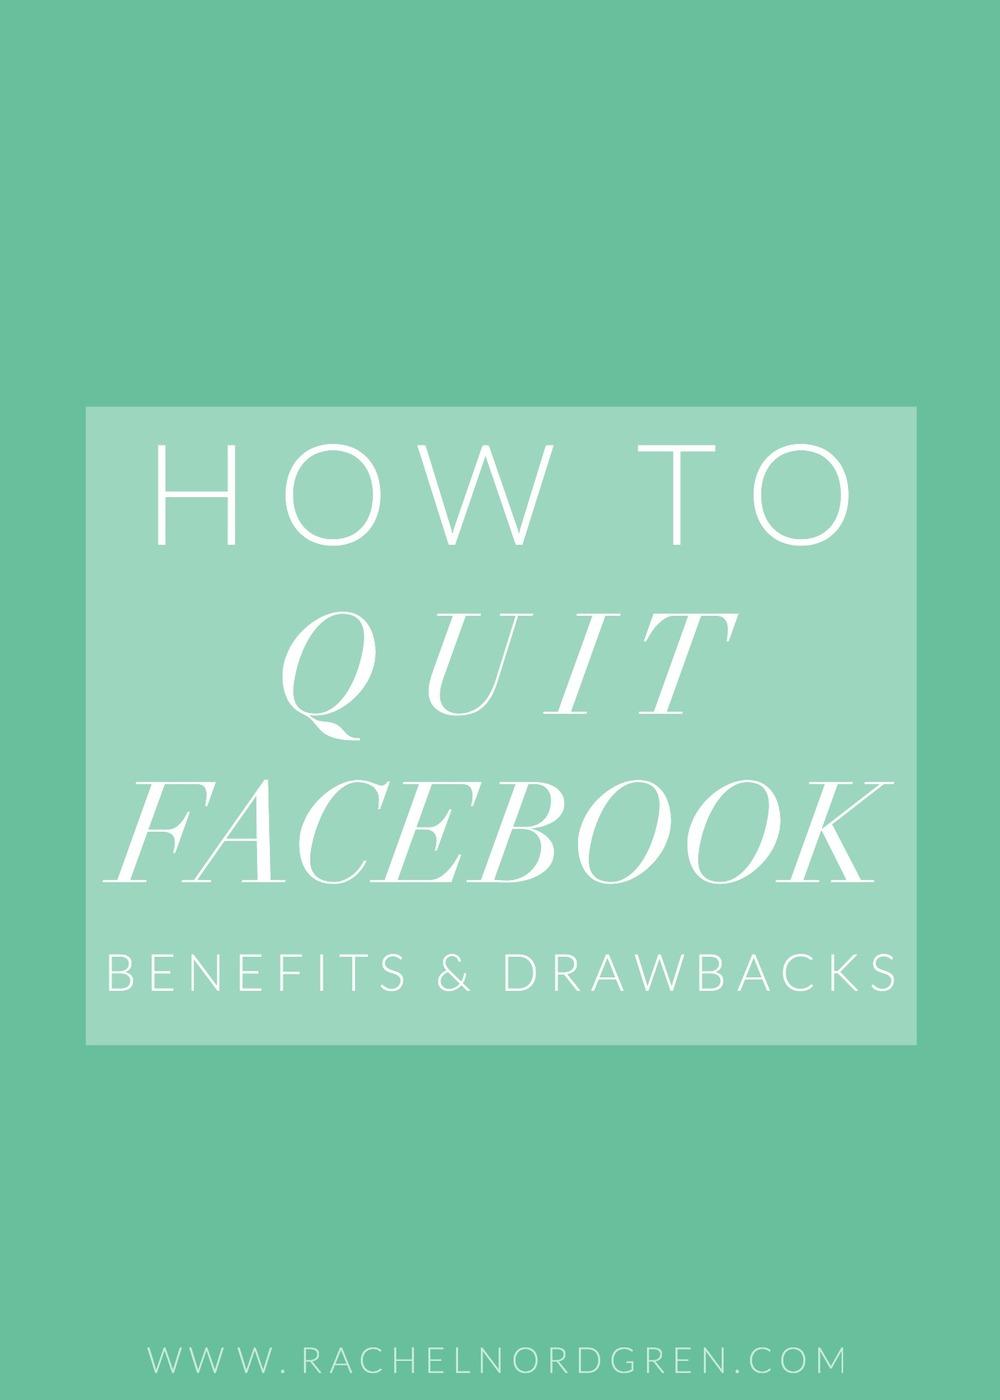 how-to-quit-facebook-2.jpg